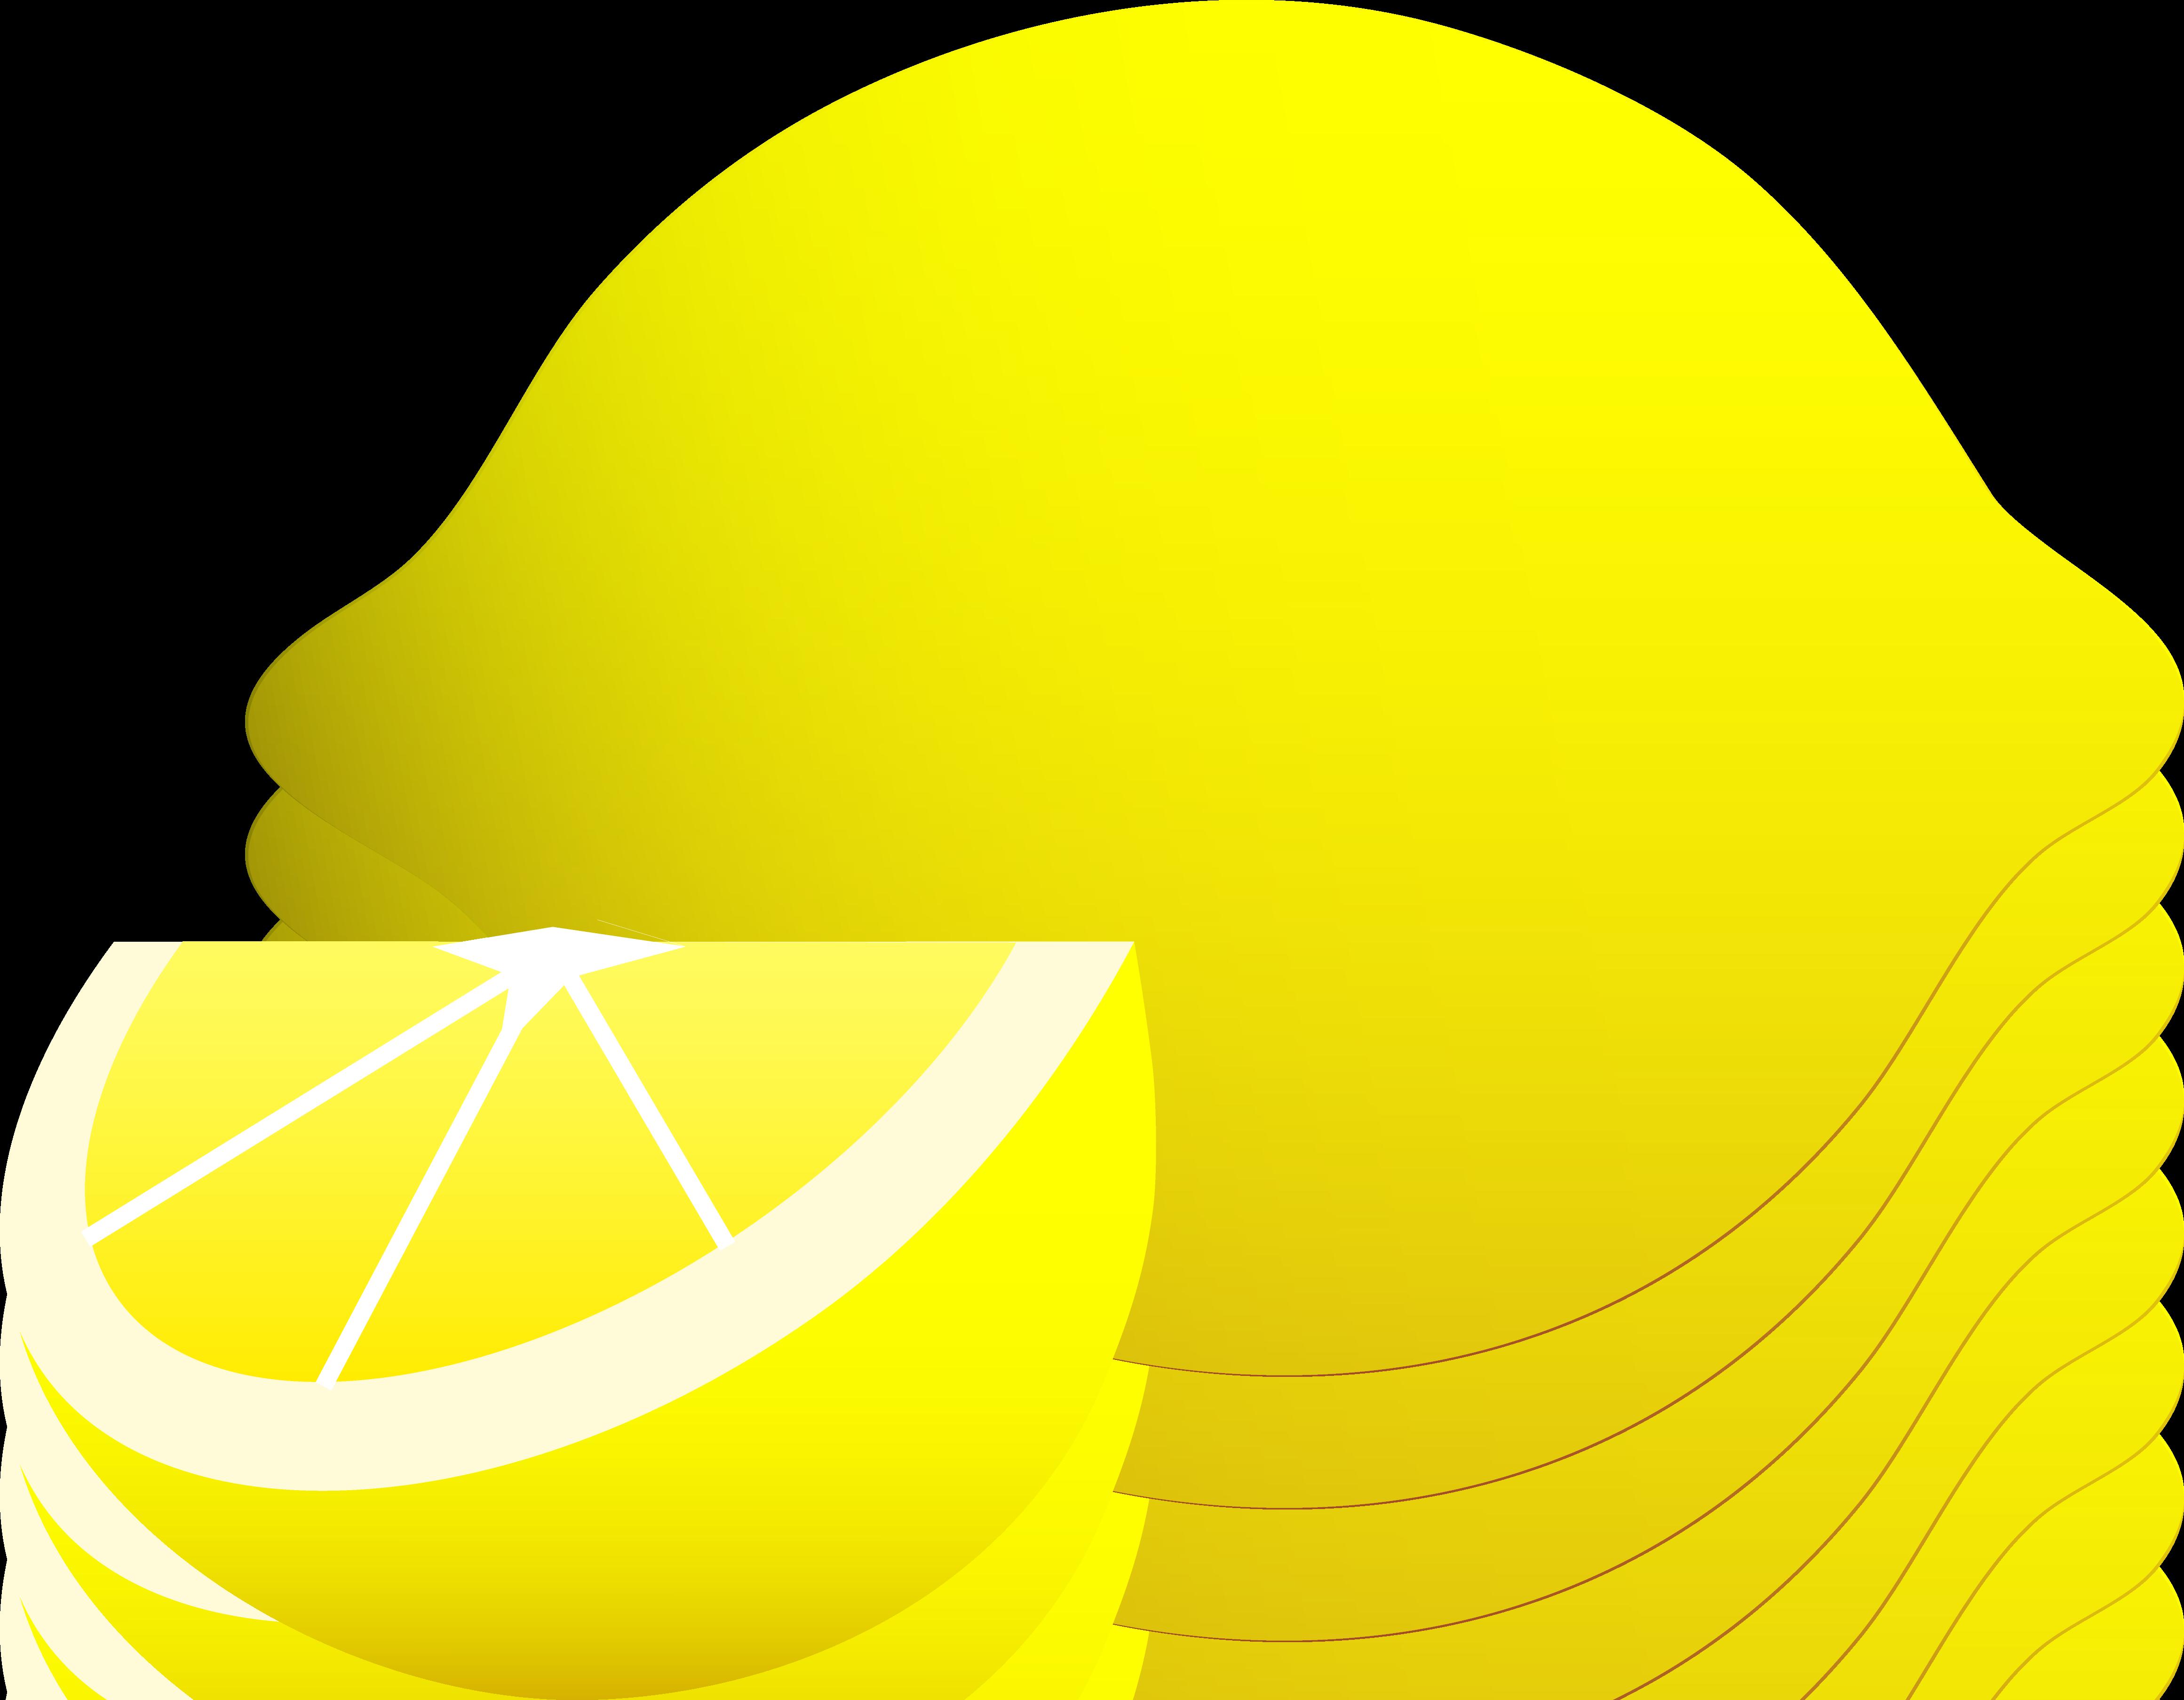 4643x3614 Whole Lemon With Wedge